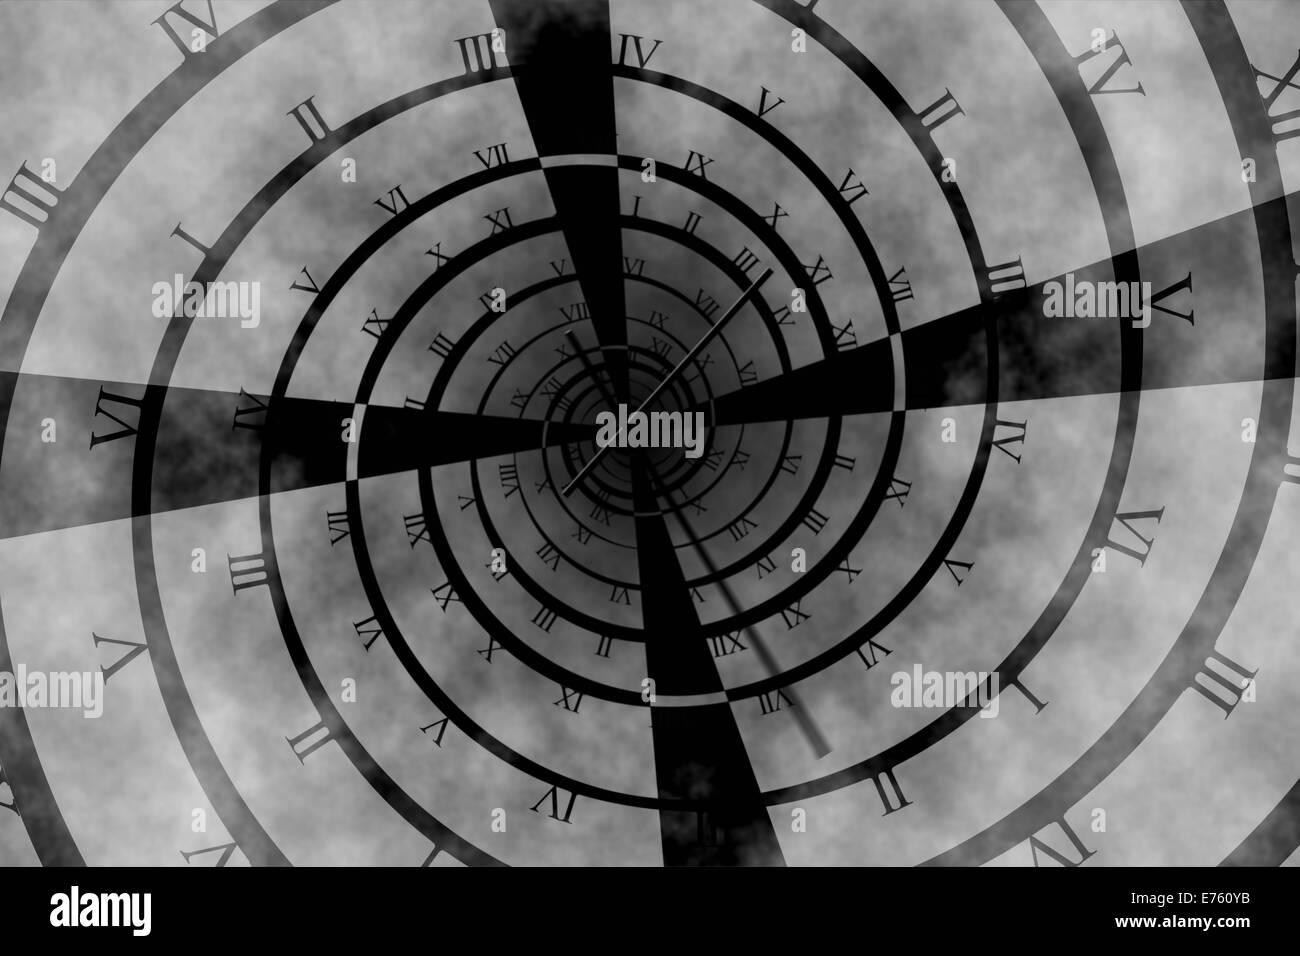 Digitally generated roman numeral clock vortex - Stock Image